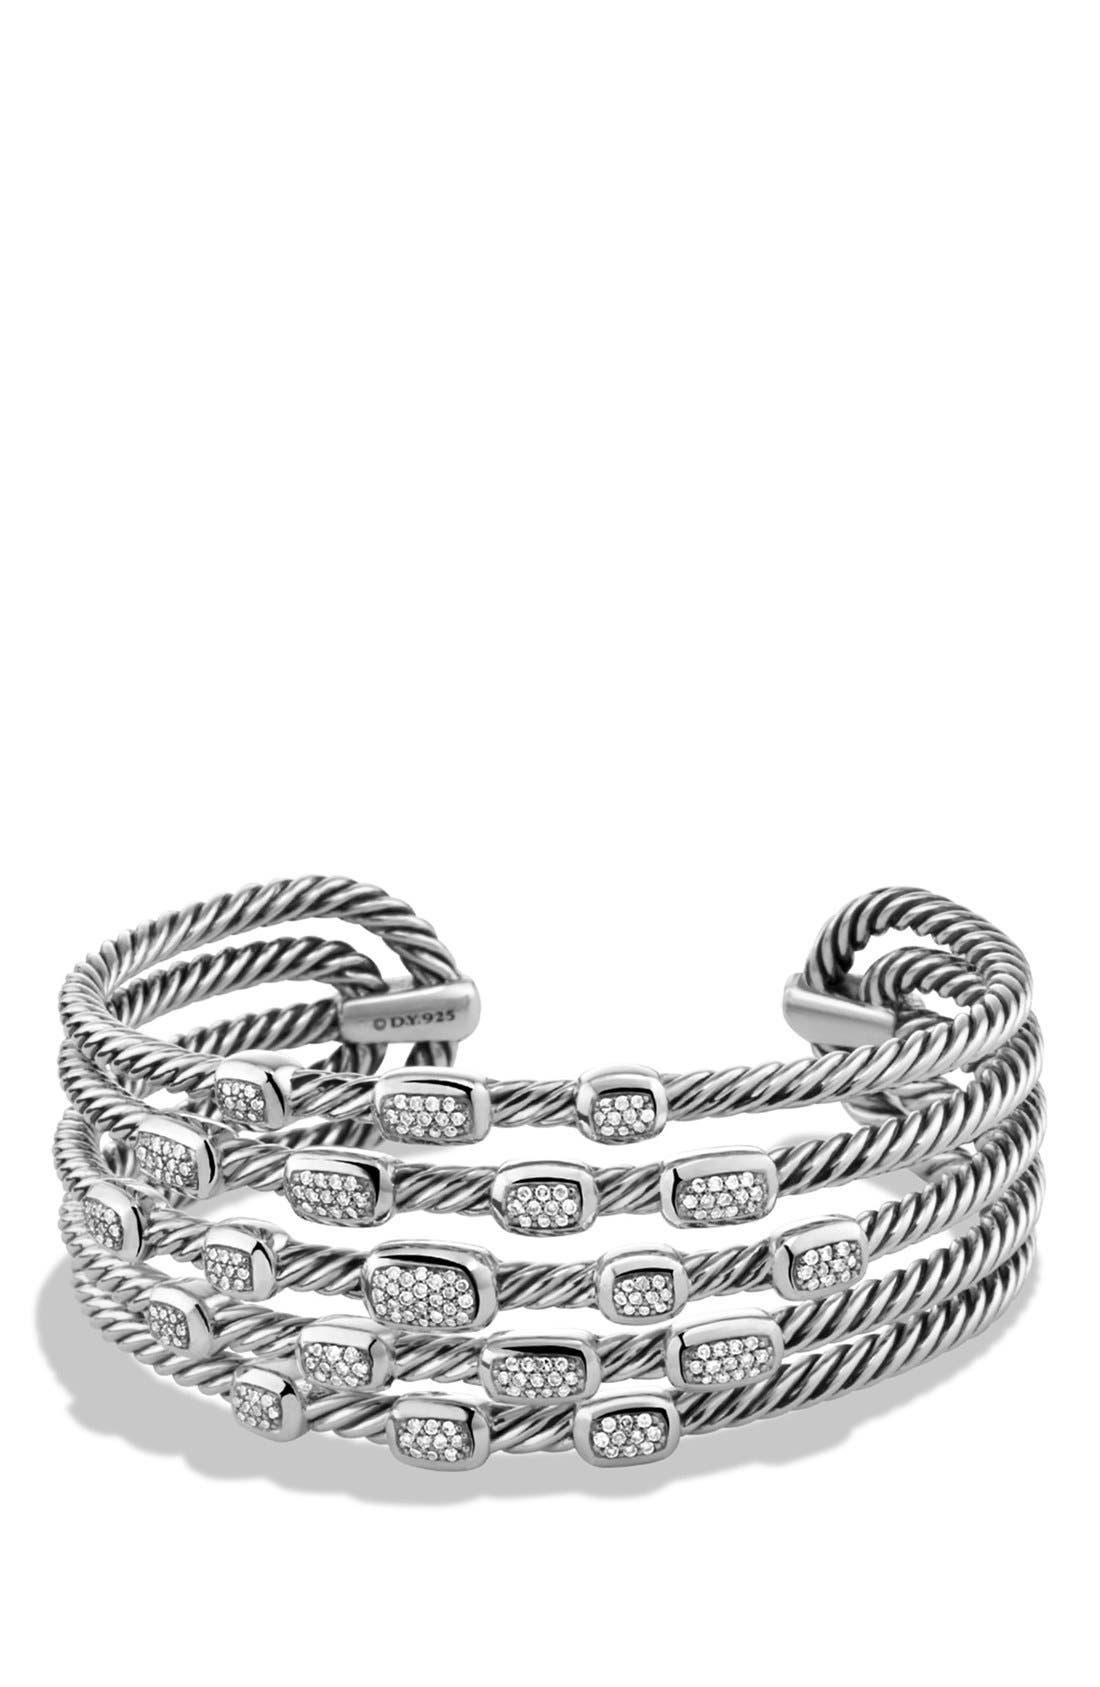 'Confetti' Wide Cuff Bracelet with Diamonds,                             Main thumbnail 1, color,                             040